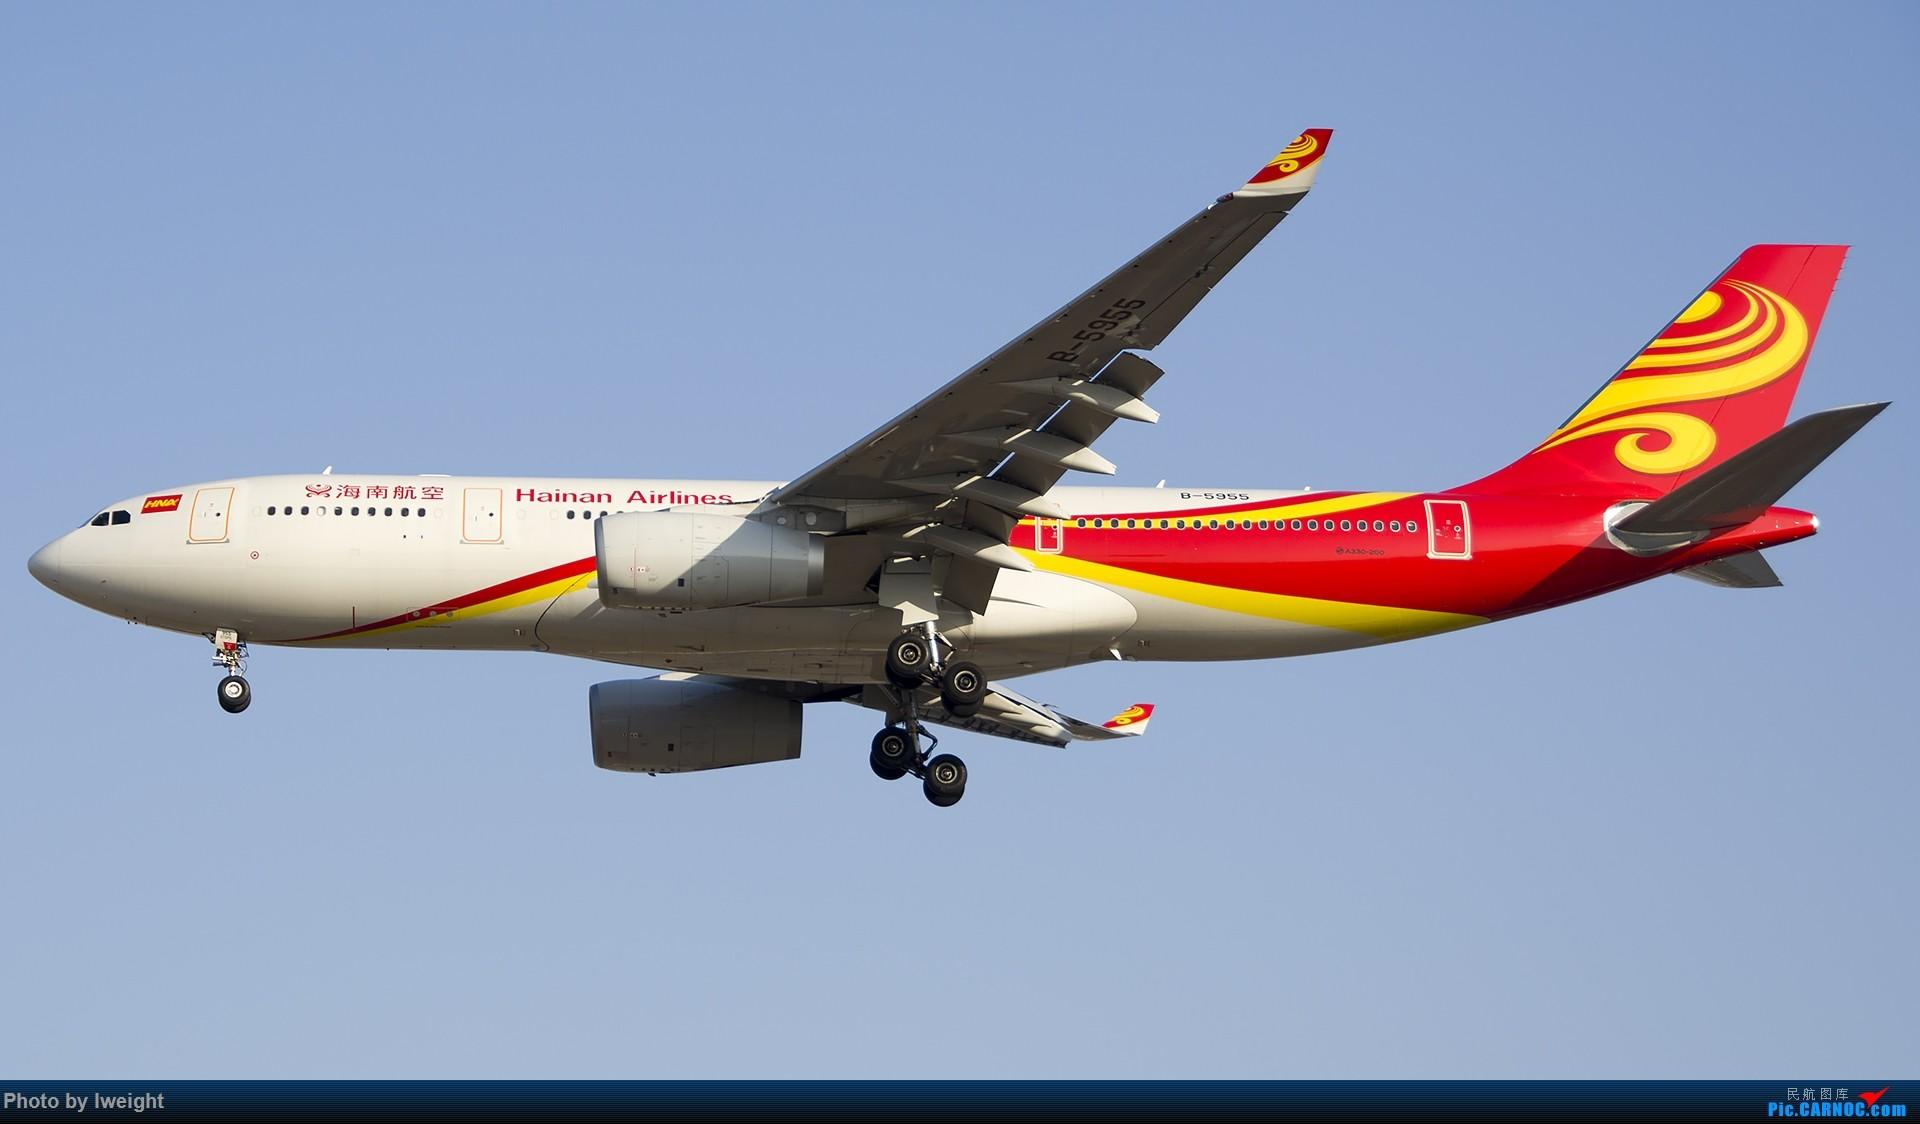 Re:[原创]庆祝升级777,发上今天在首都机场拍的所有飞机【2014-12-14】 AIRBUS A330-200 B-5955 中国北京首都国际机场